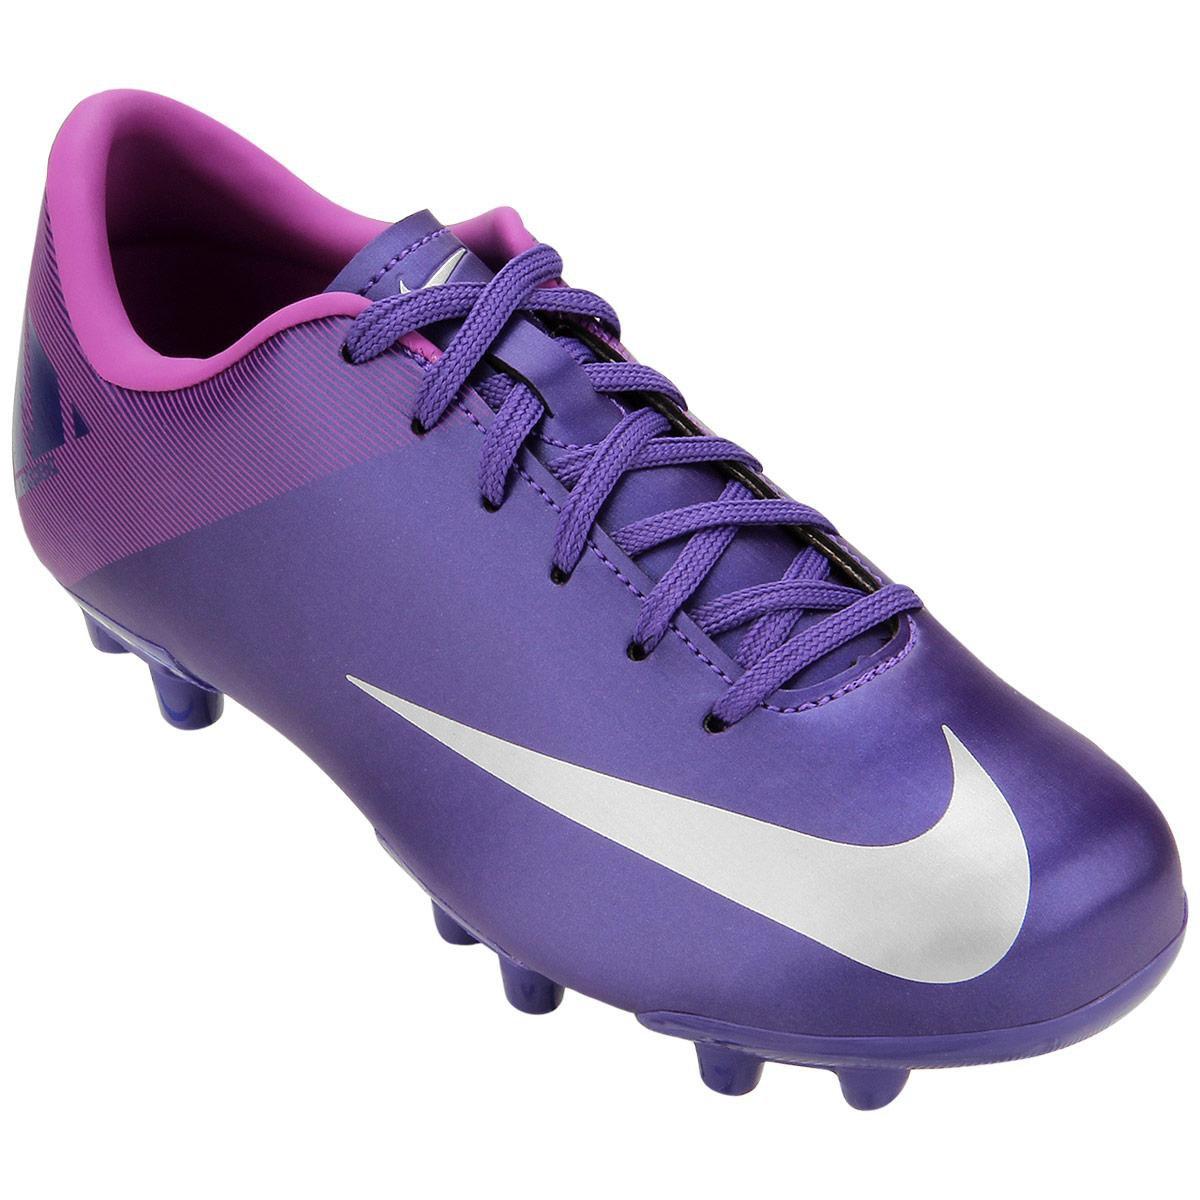 8231e8886b821 Chuteira Nike Mercurial Victory 2 FG Infantil   Loja do Inter